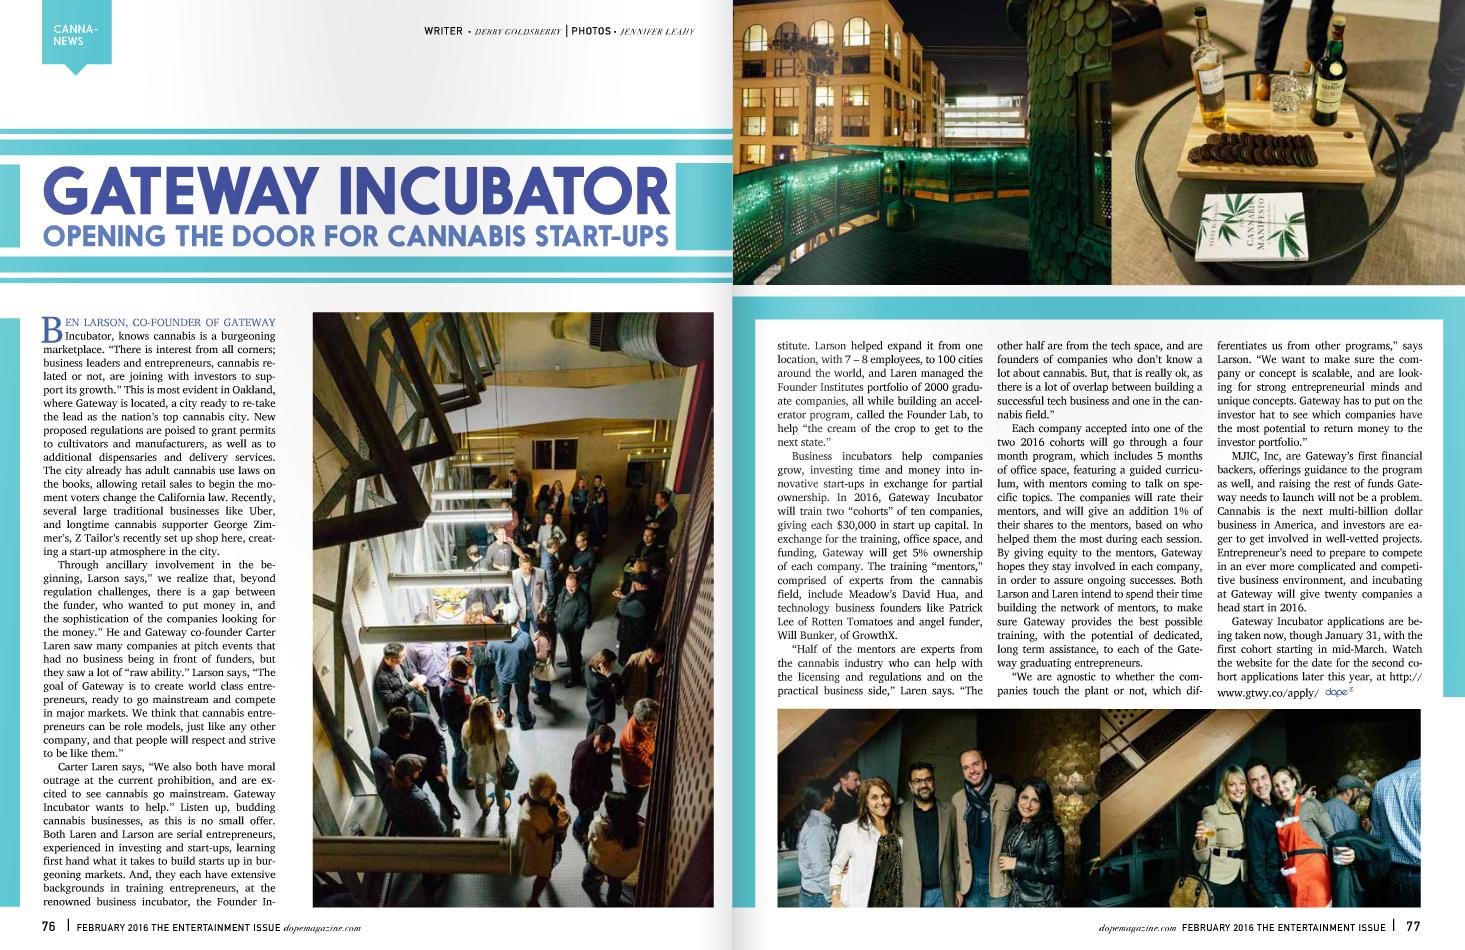 dope-gateway-incubator